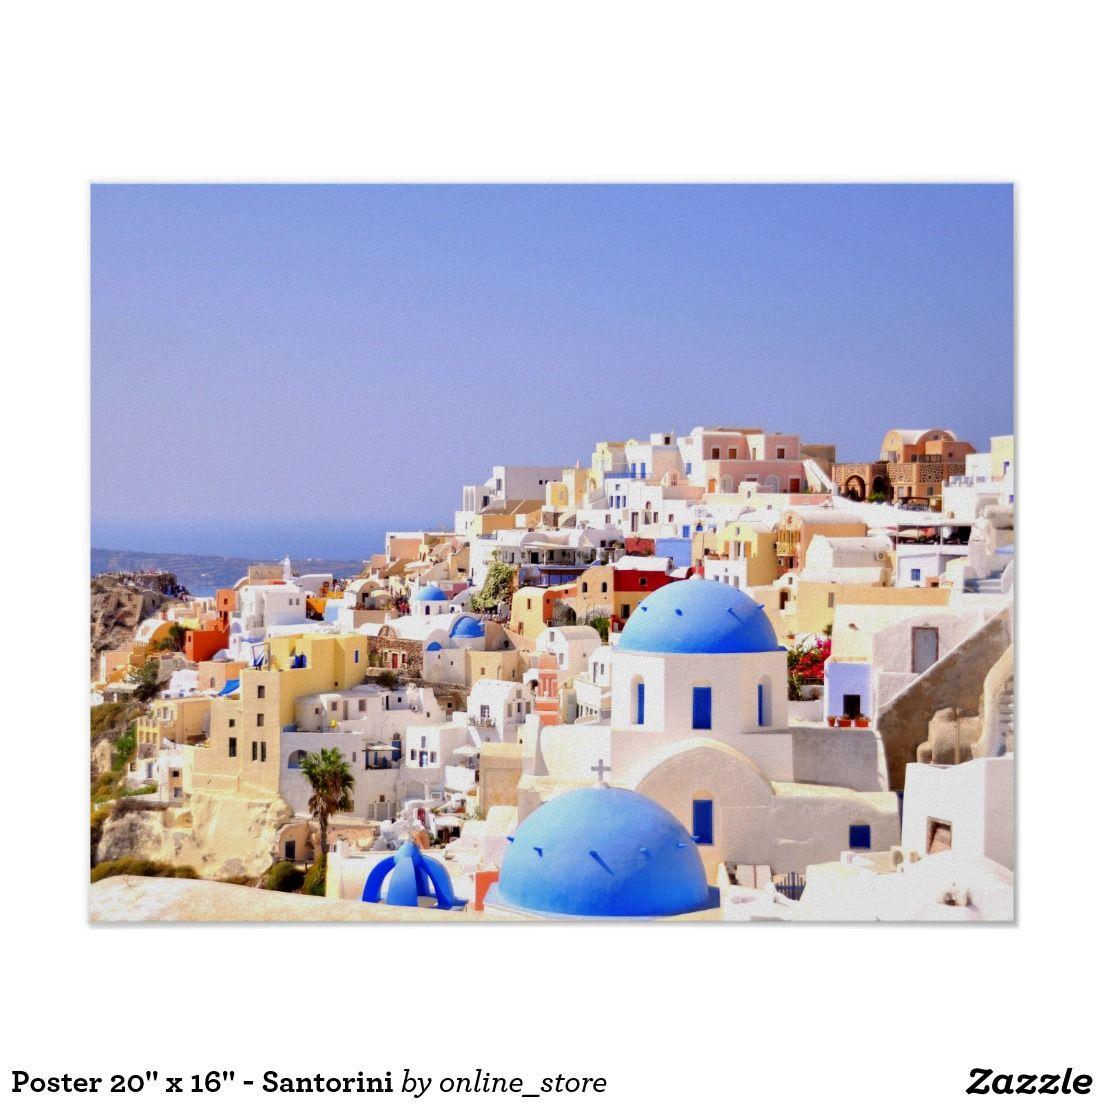 "Poster 20"" x 16"" - Santorini"